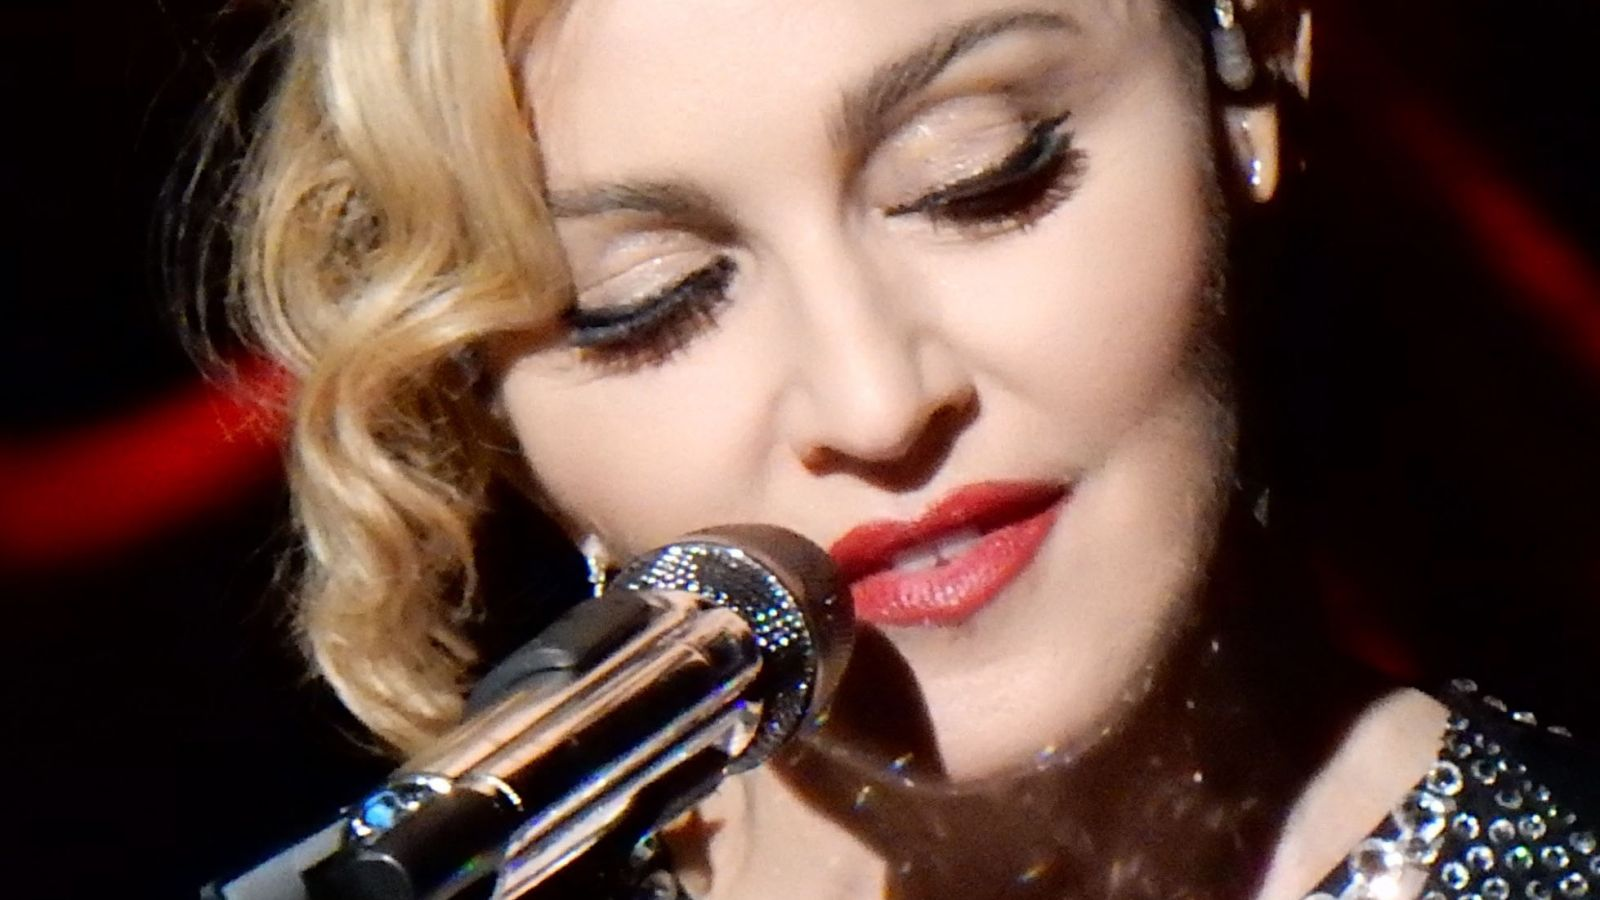 Madonna: Η φωτογραφία της ουλής της από το χειρουργείο, στο Instagram [pics]